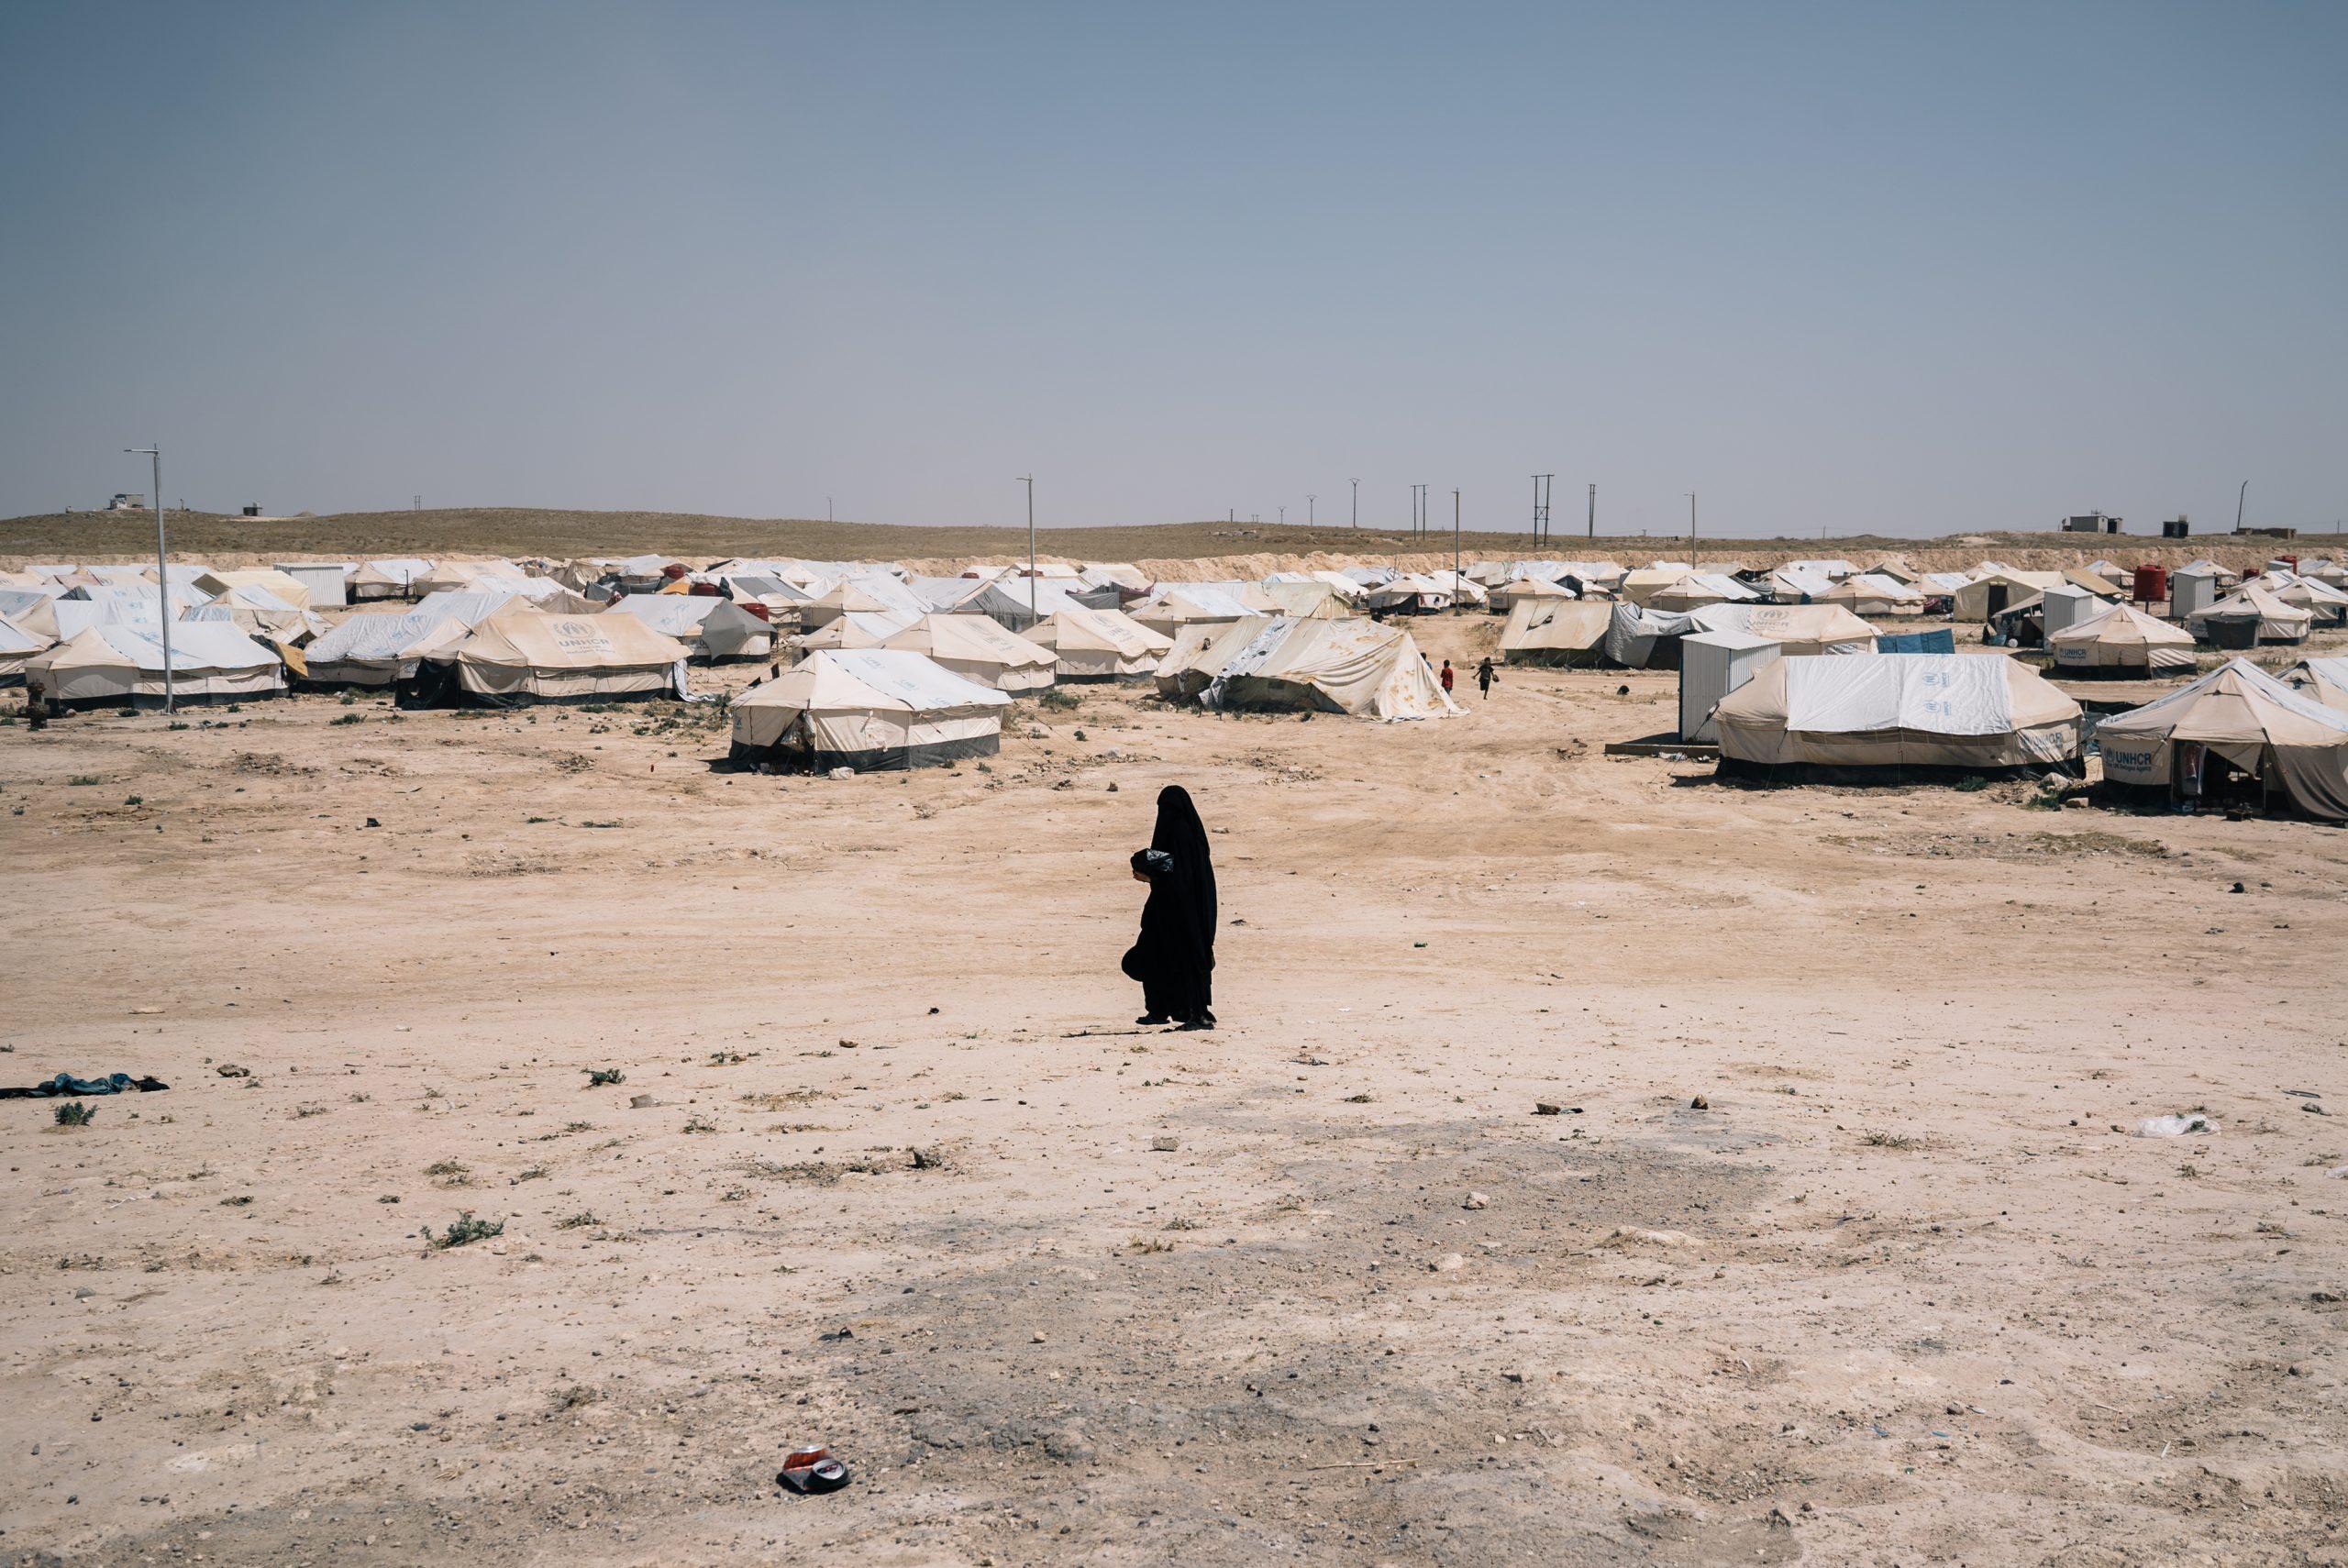 Humanitarian aid or ISIS fundraising?